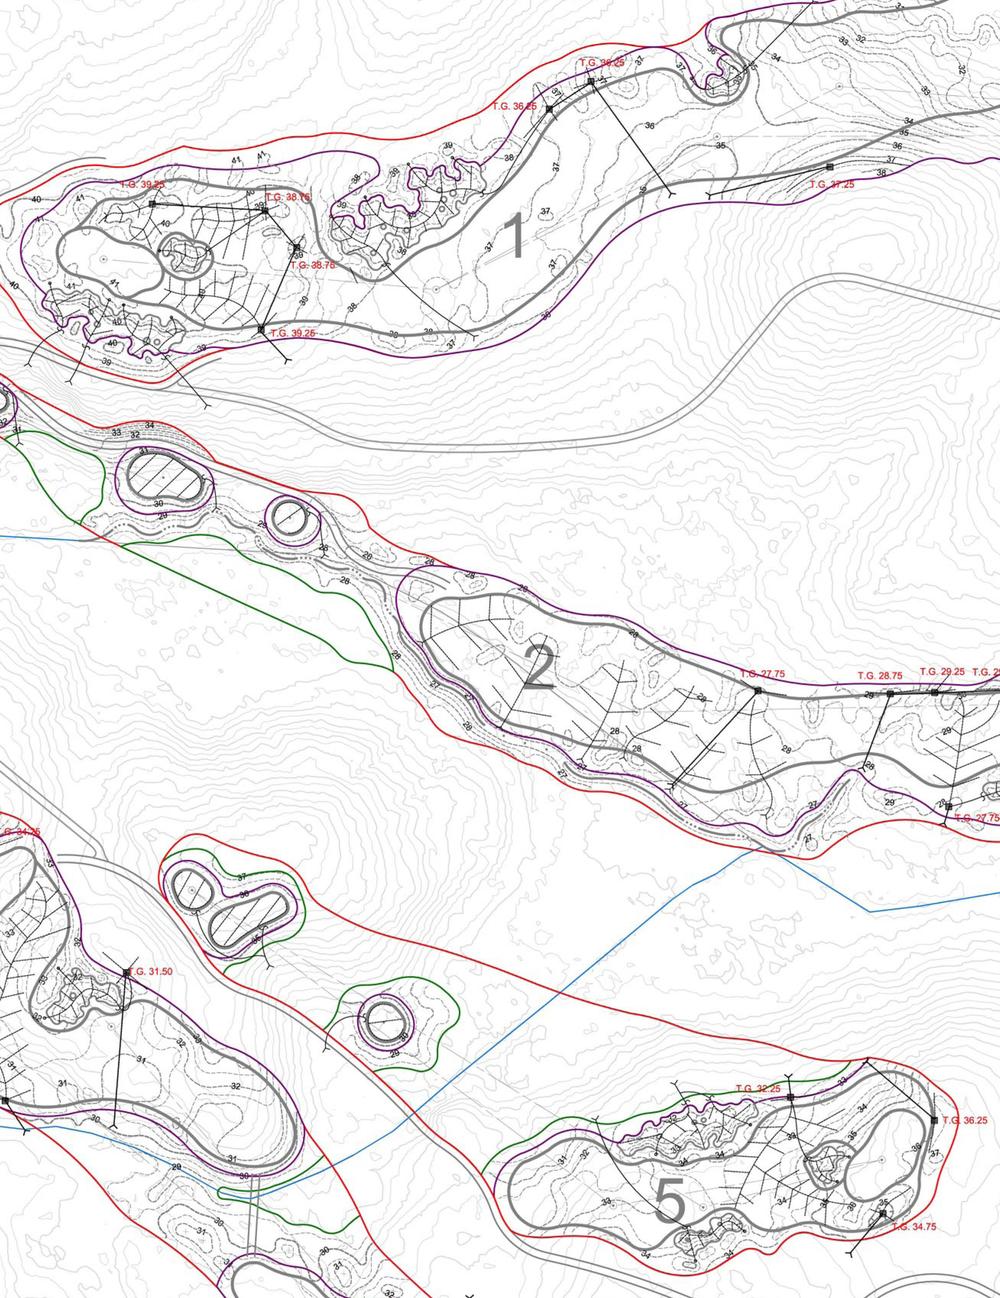 08_drainage concept plan 1000sc.jpg